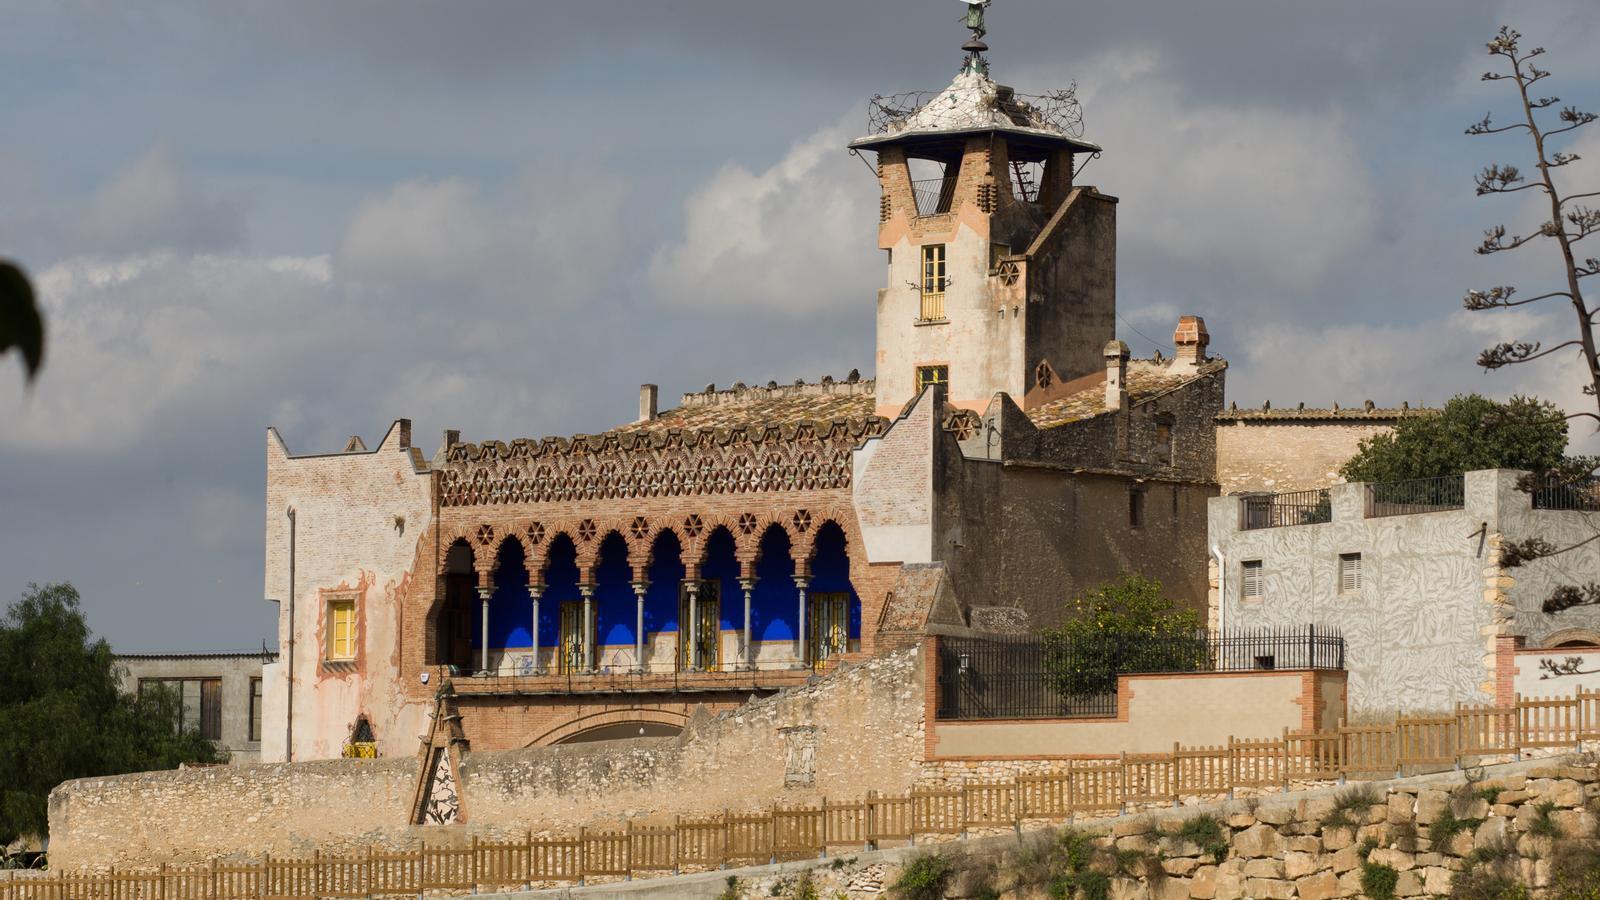 La Casa Bofarull, de Josep Maria Jujol / TJERK VAN DER MEULEN